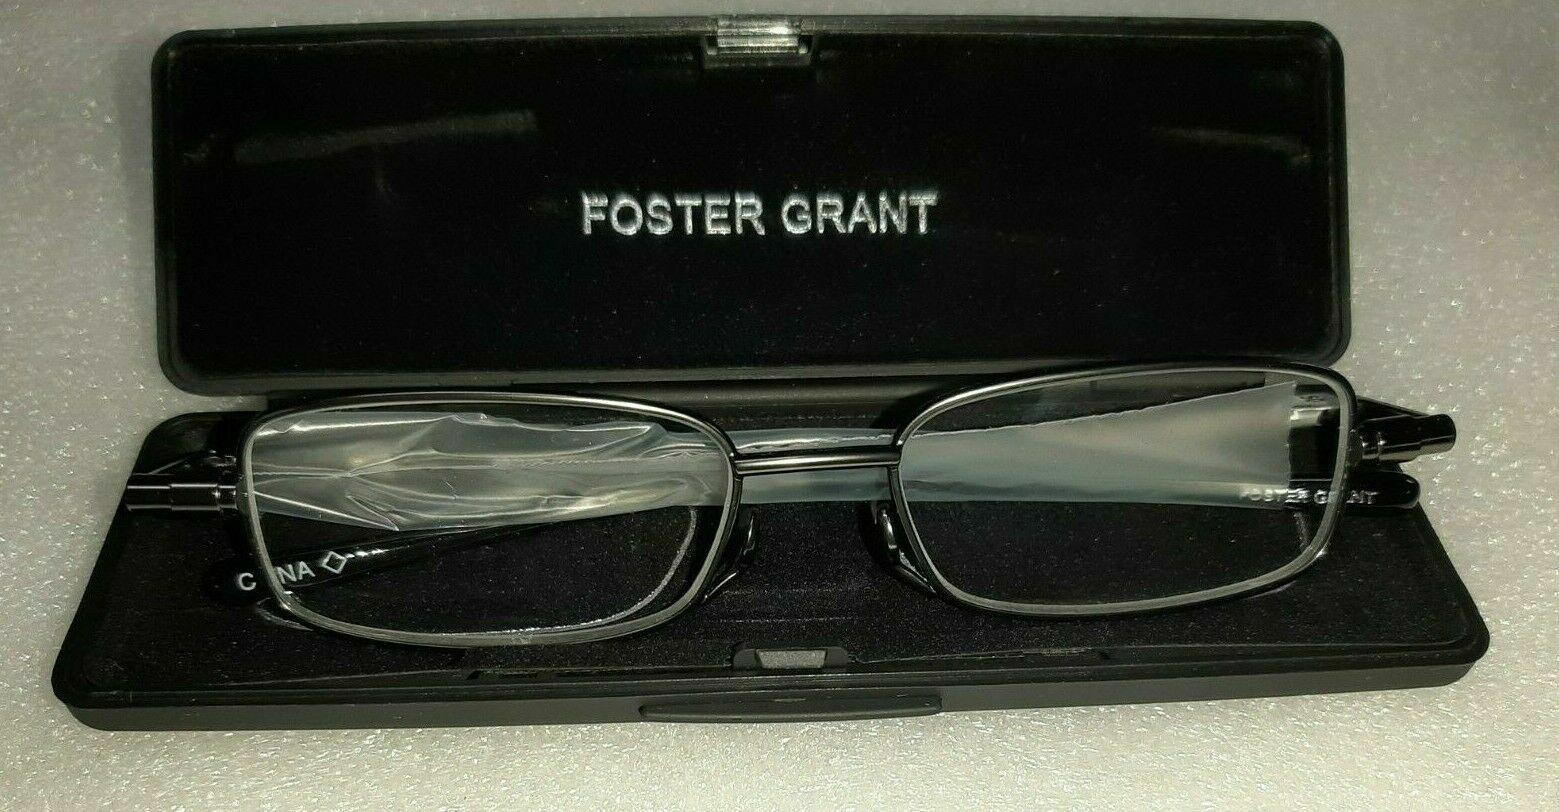 FOSTER GRANT Fold Flat Reader - Gavin Choose Your Strength -